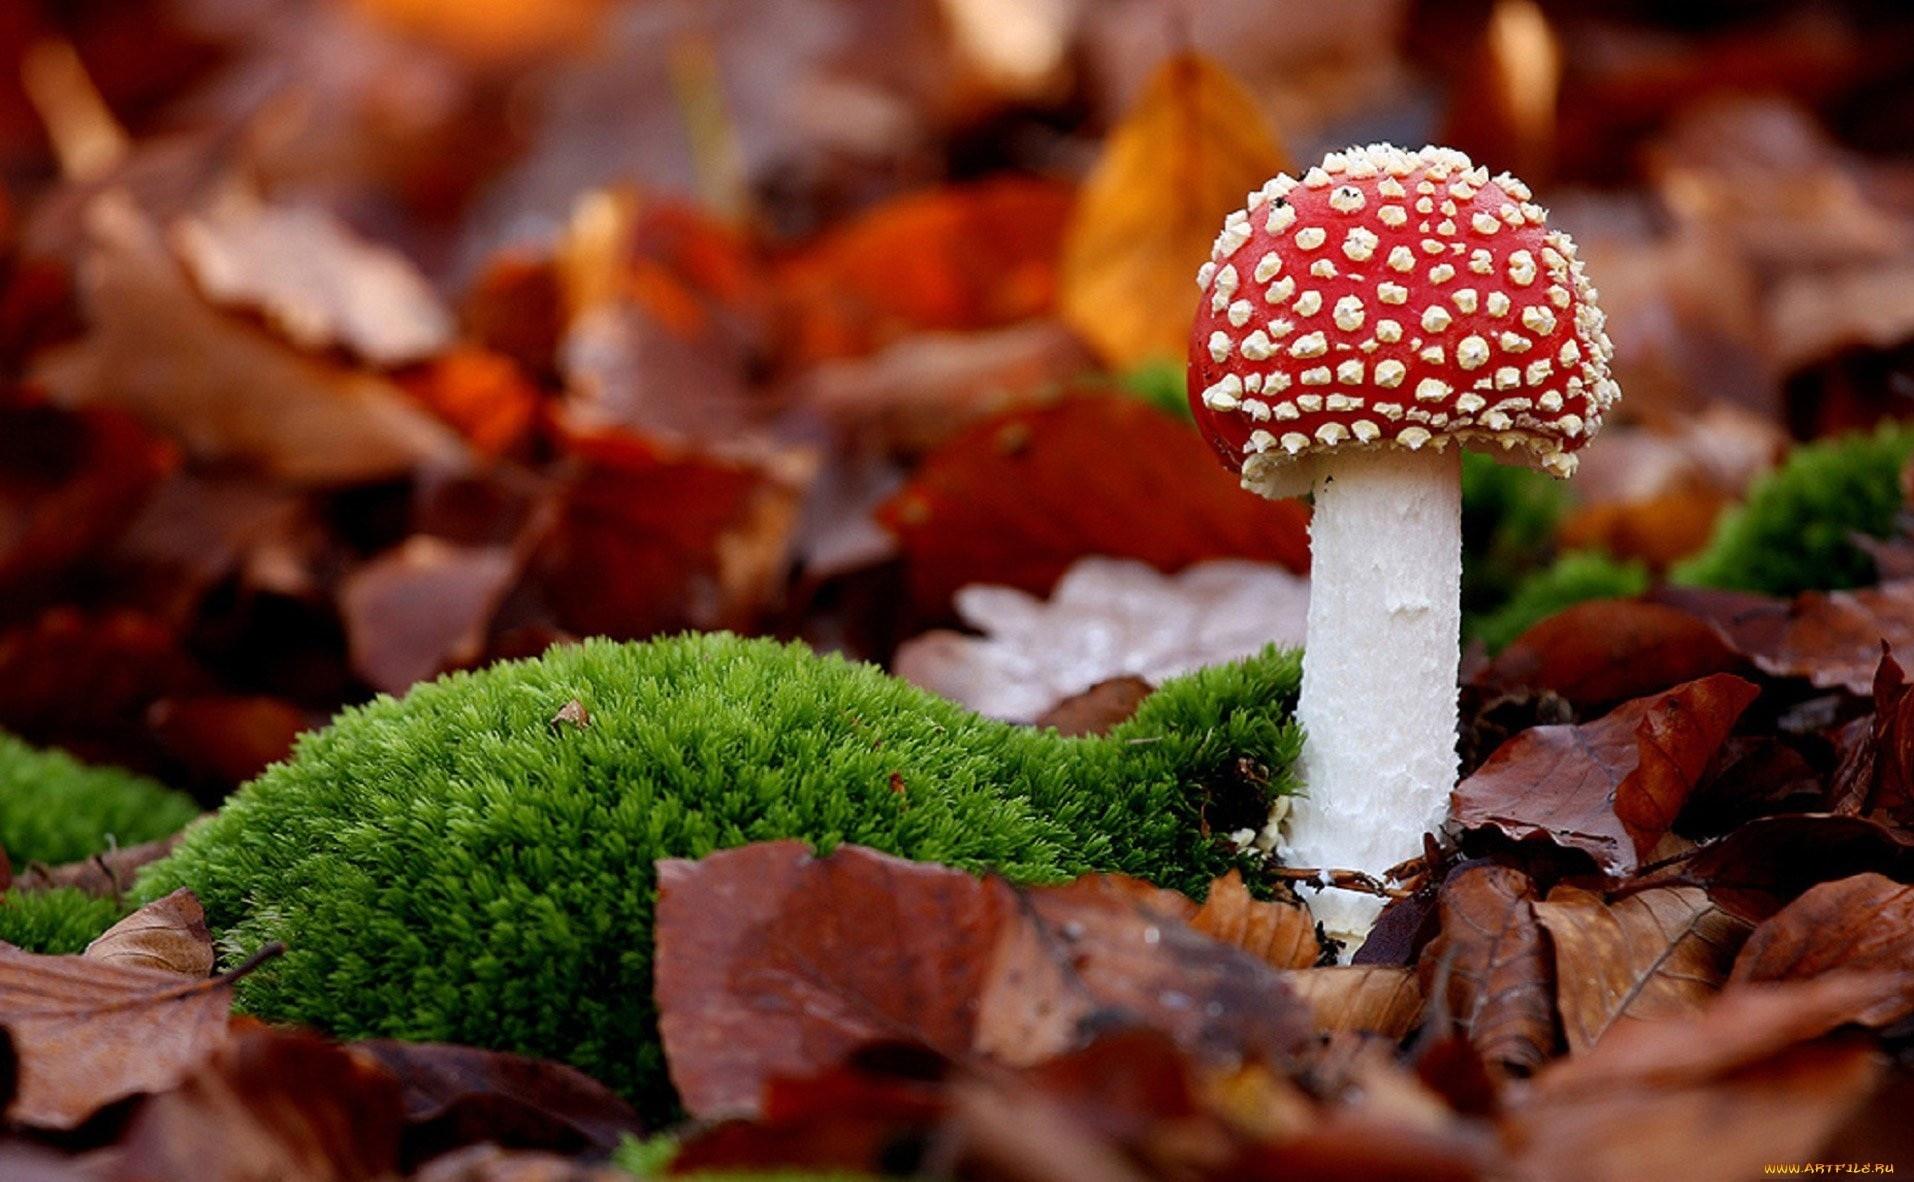 Free Download Mushroom On Wood Wallpaper Pc Wallpaper Wallpaperlepi 1914x1182 For Your Desktop Mobile Tablet Explore 46 Mushrooms Wallpaper Shroom Wallpapers Mario Mushroom Wallpaper Morel Mushroom Wallpaper